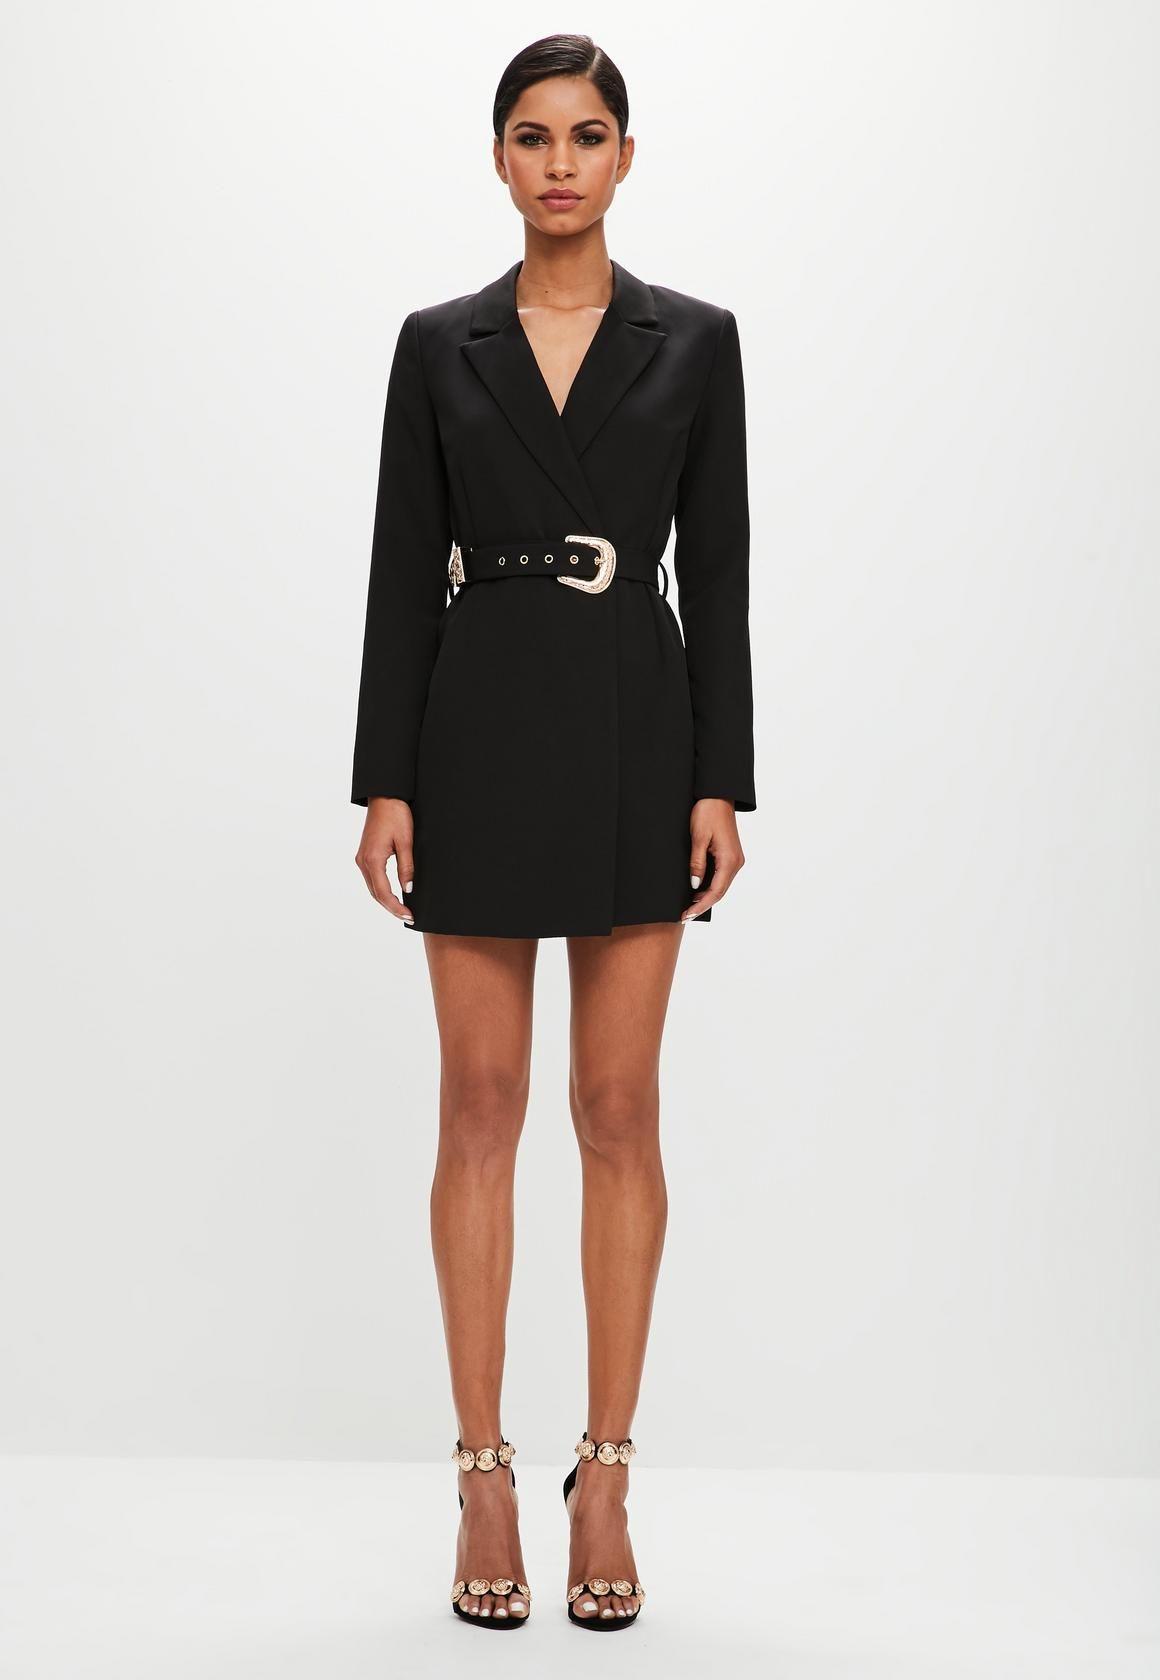 304e72da05d Missguided - Peace Love Belted Blazer Dress Black